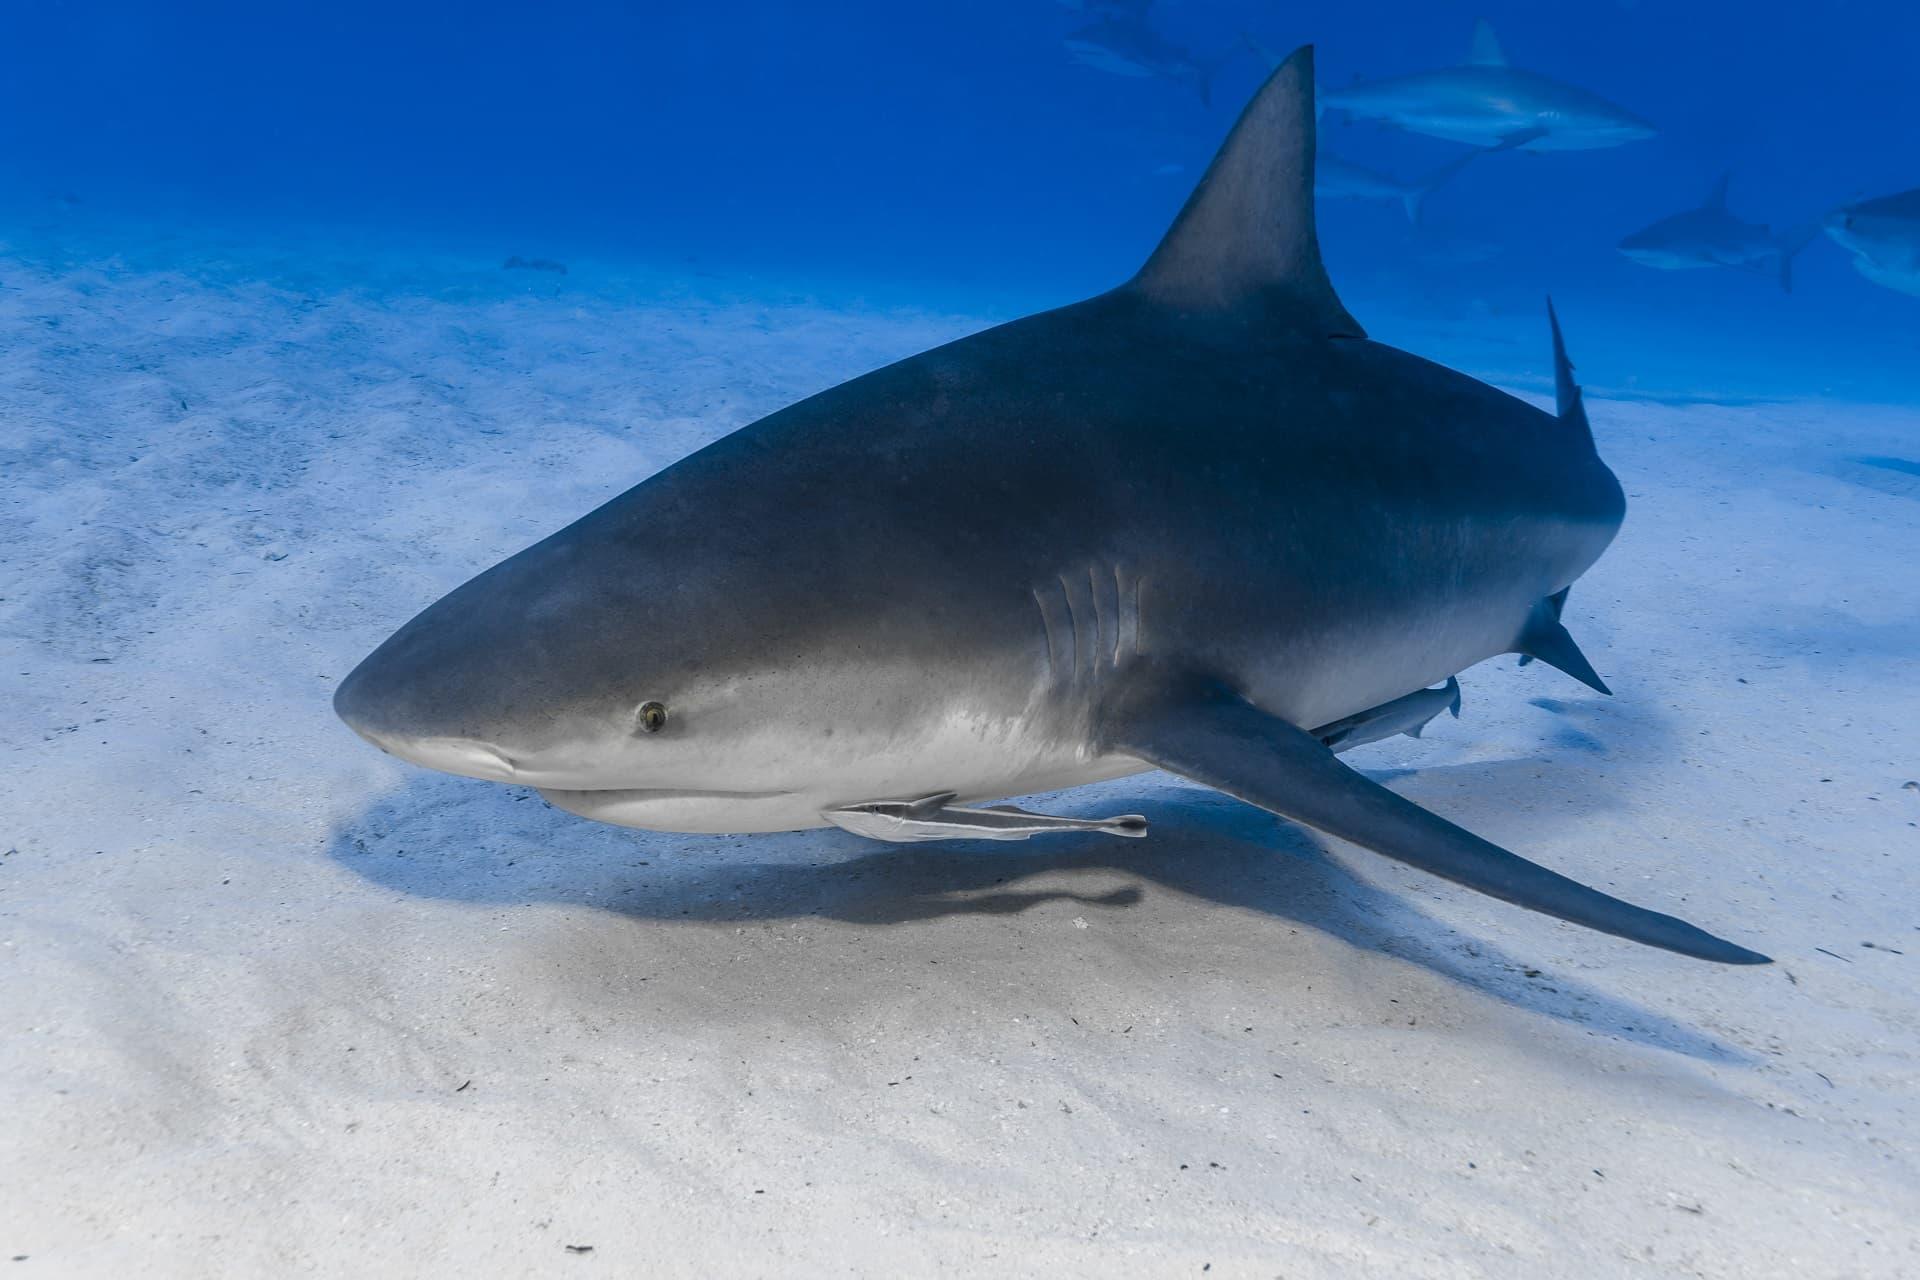 Requins-bouledogues